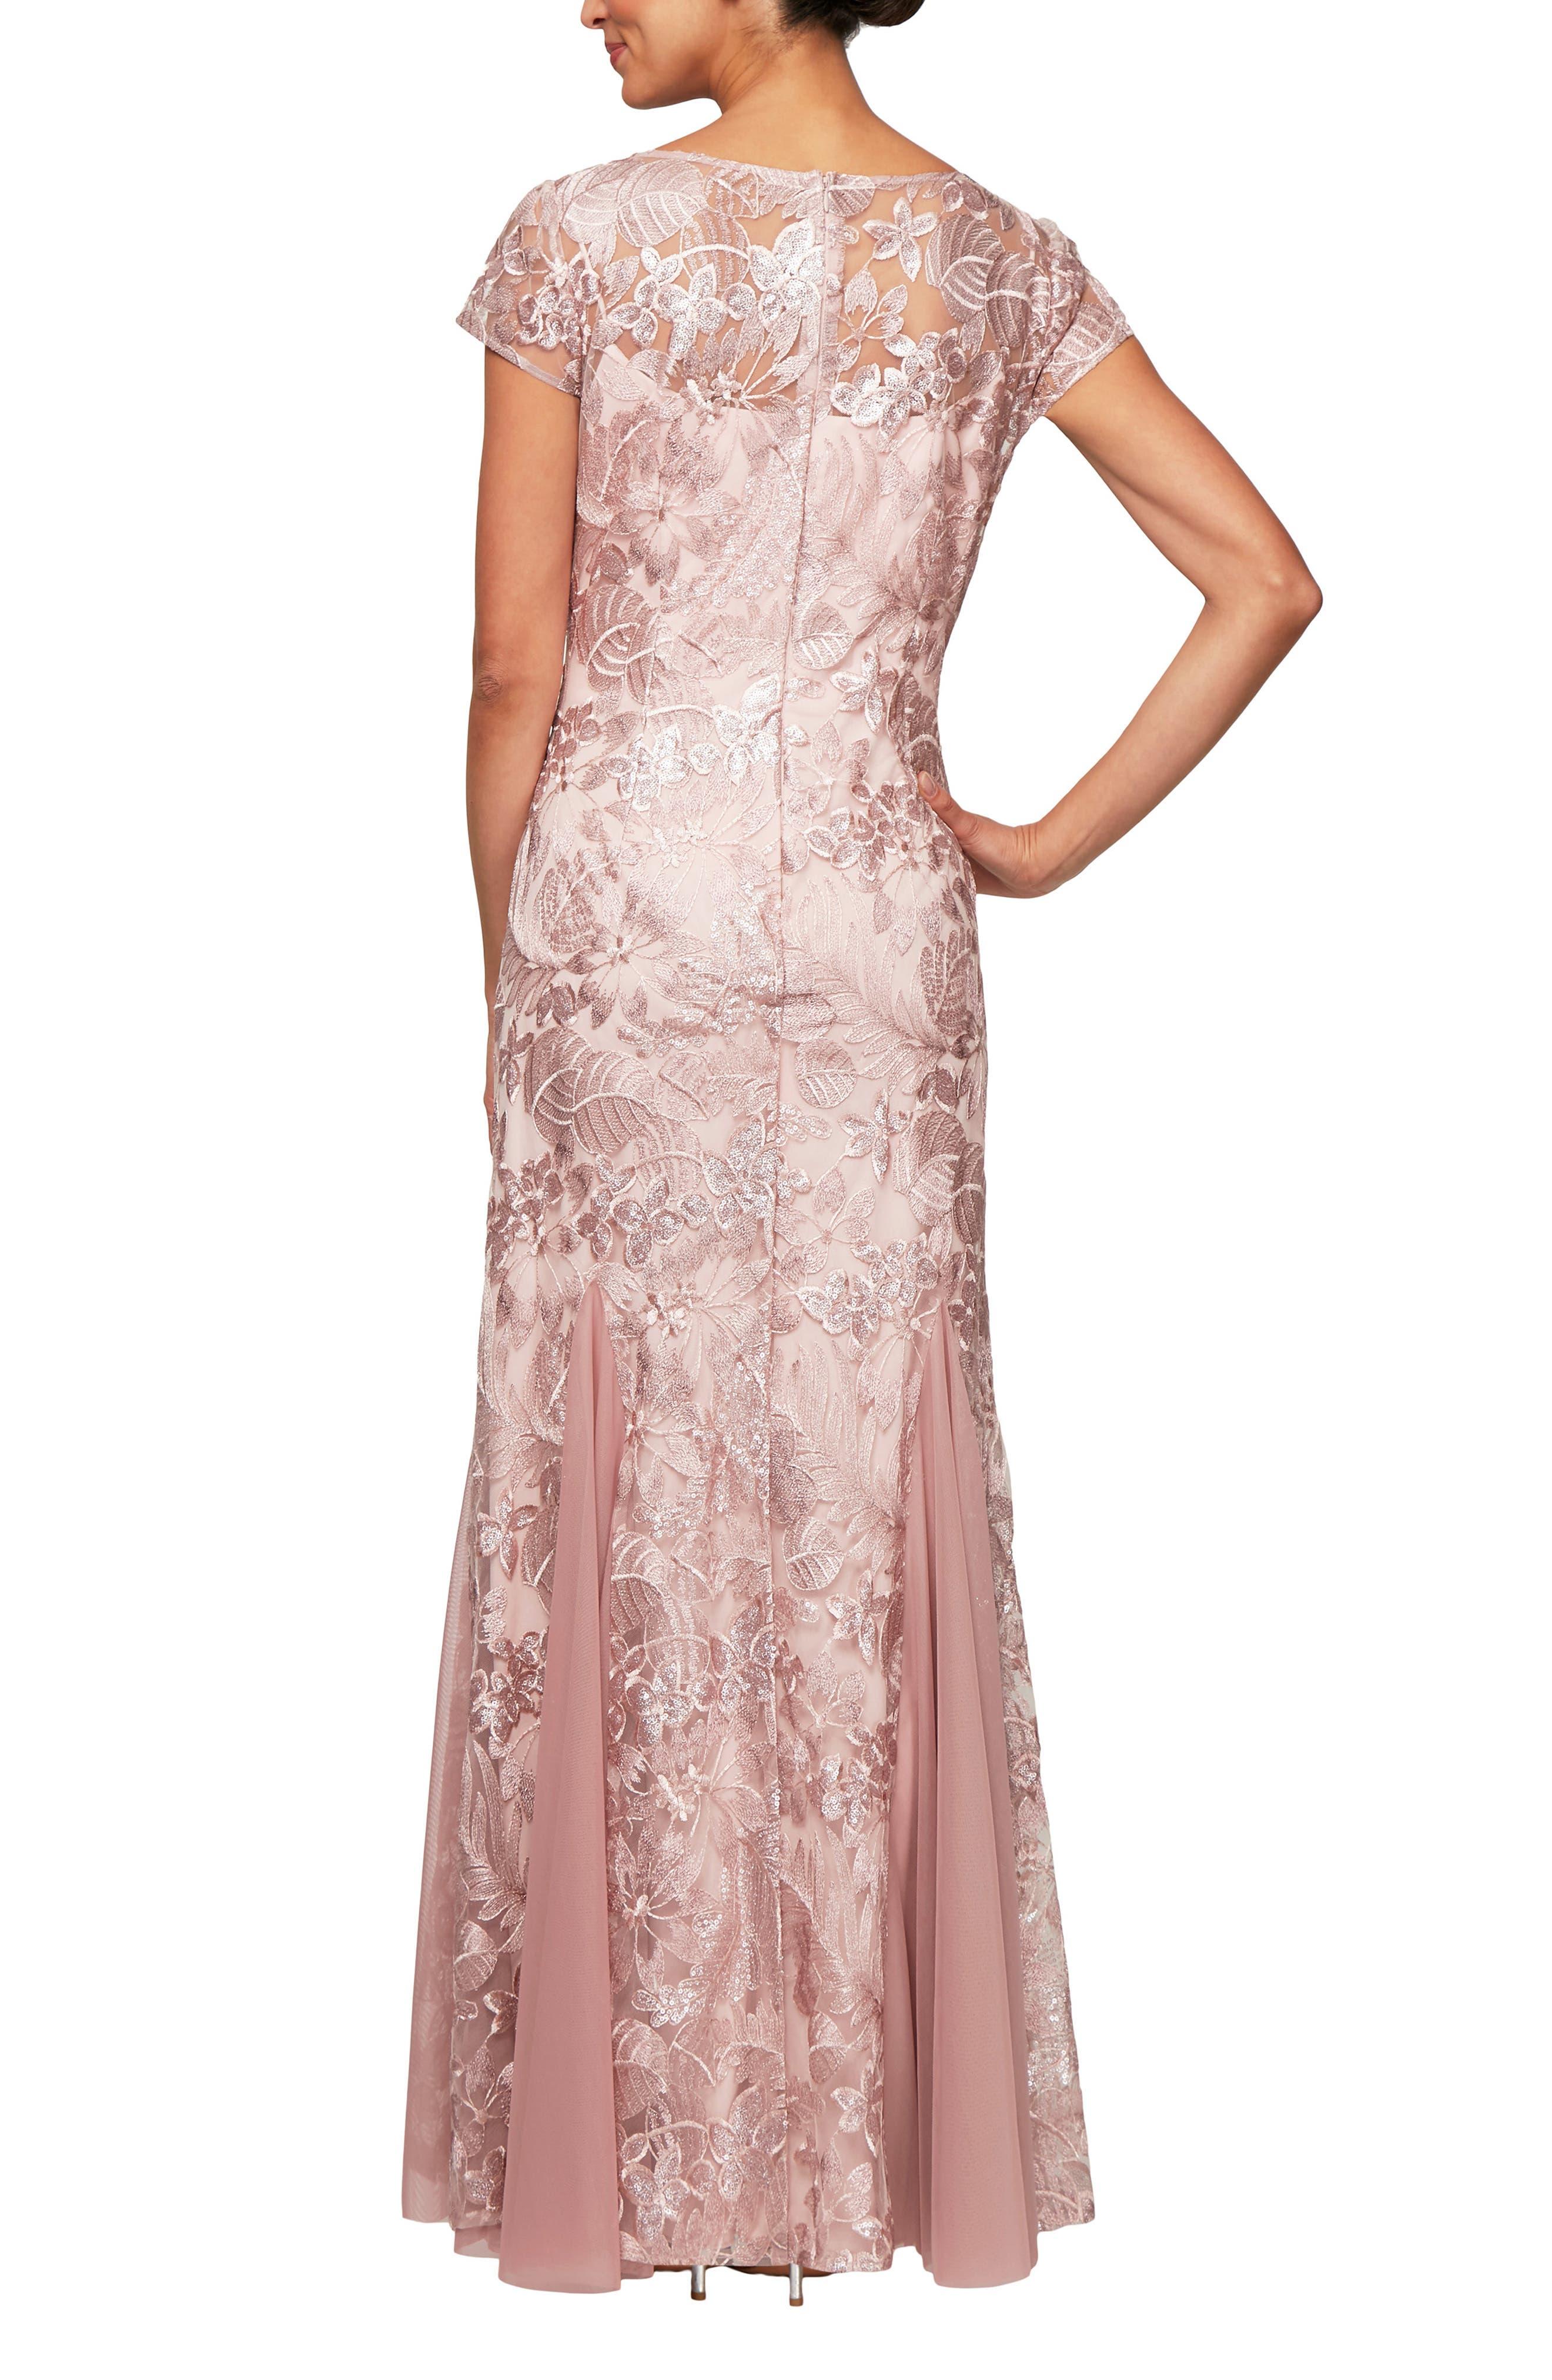 ALEX EVENINGS,                             V-Neck Embroidered Evening Dress,                             Alternate thumbnail 2, color,                             BLOSSOM